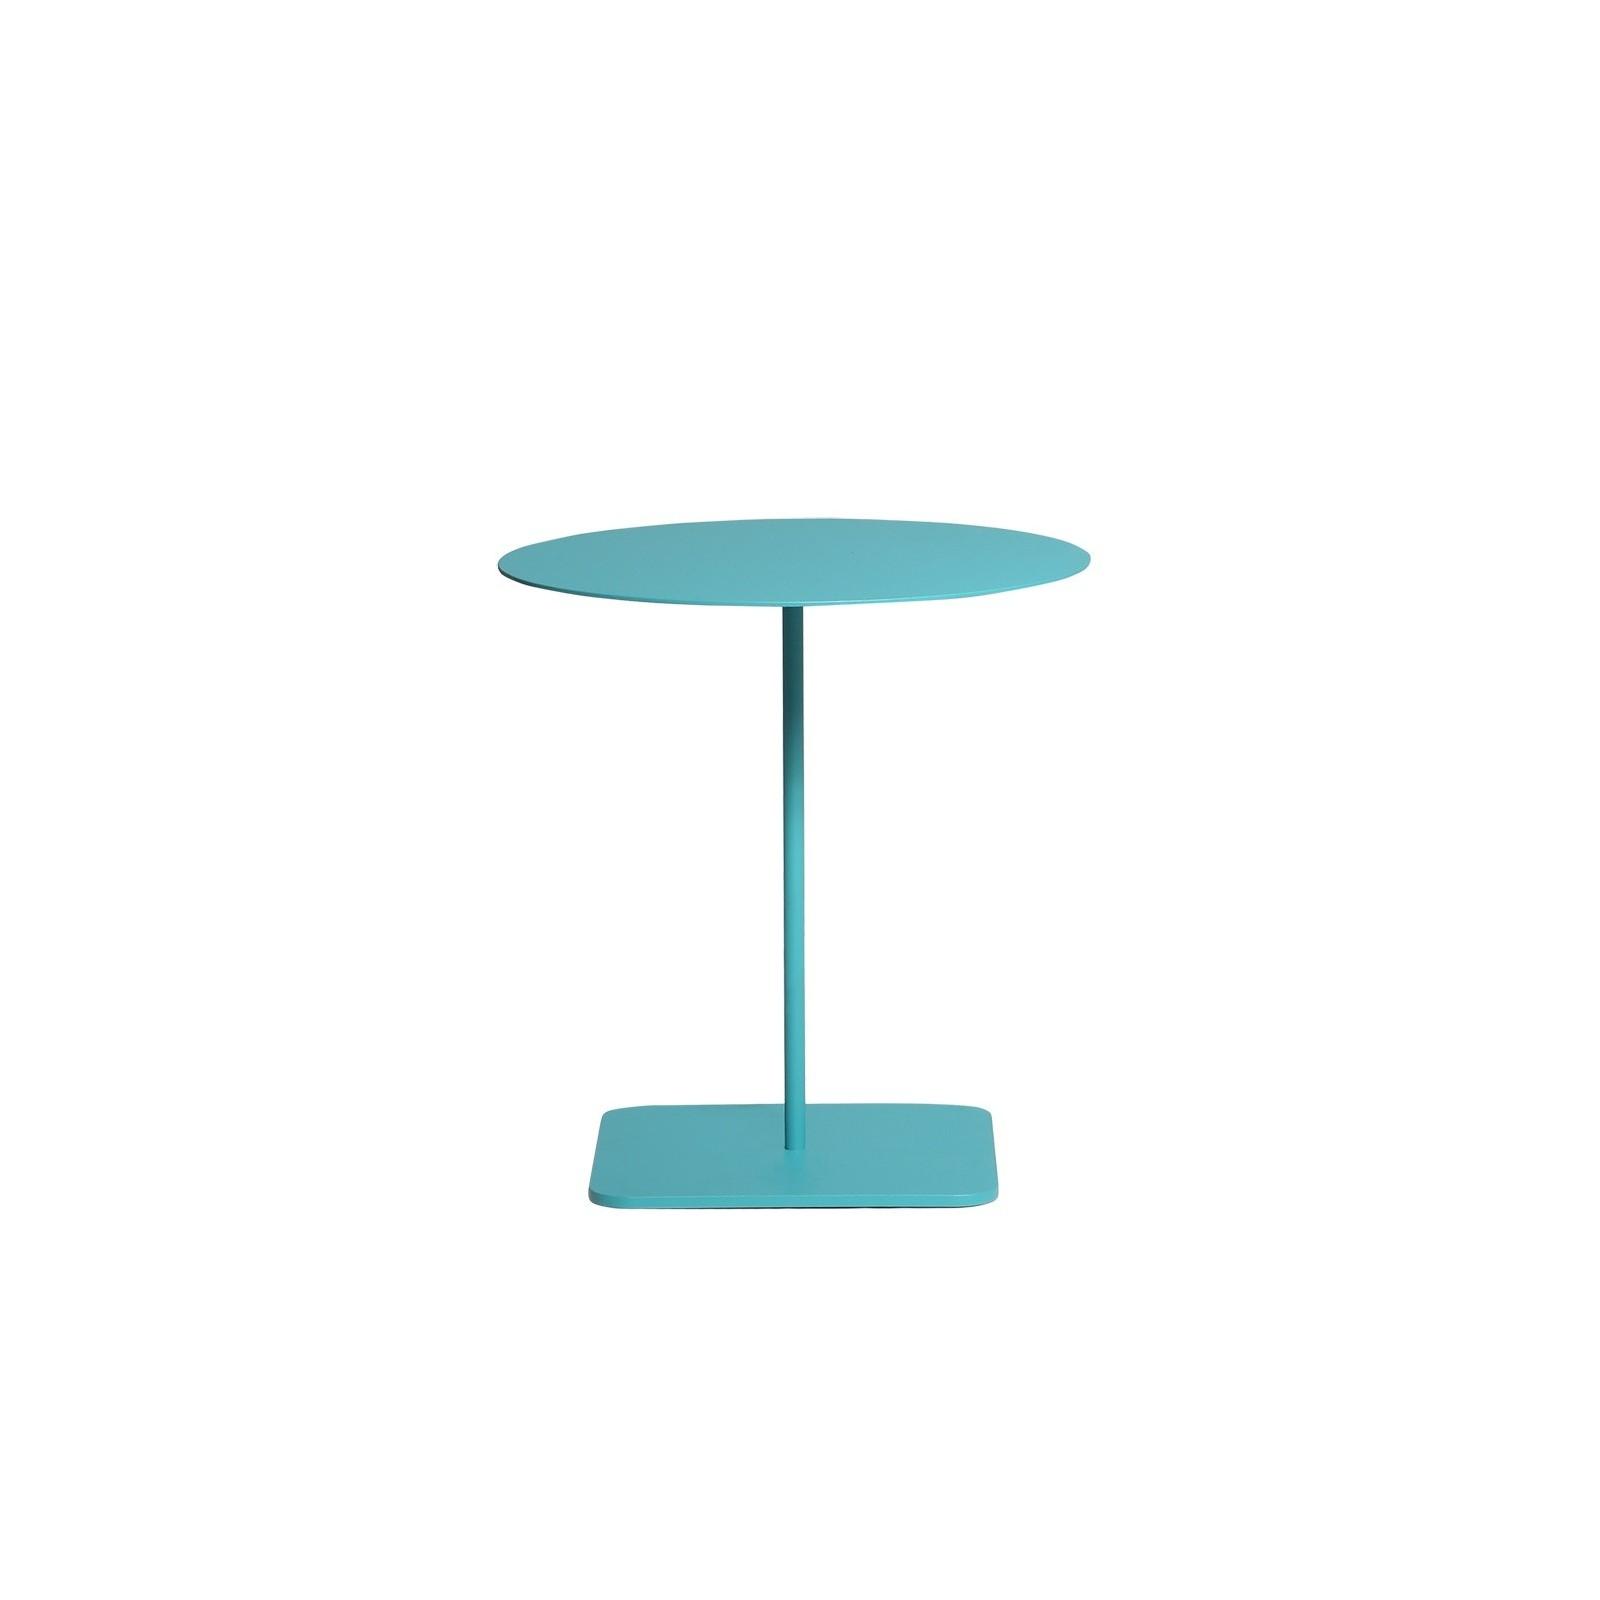 Mesita coffee table - 42 - blue